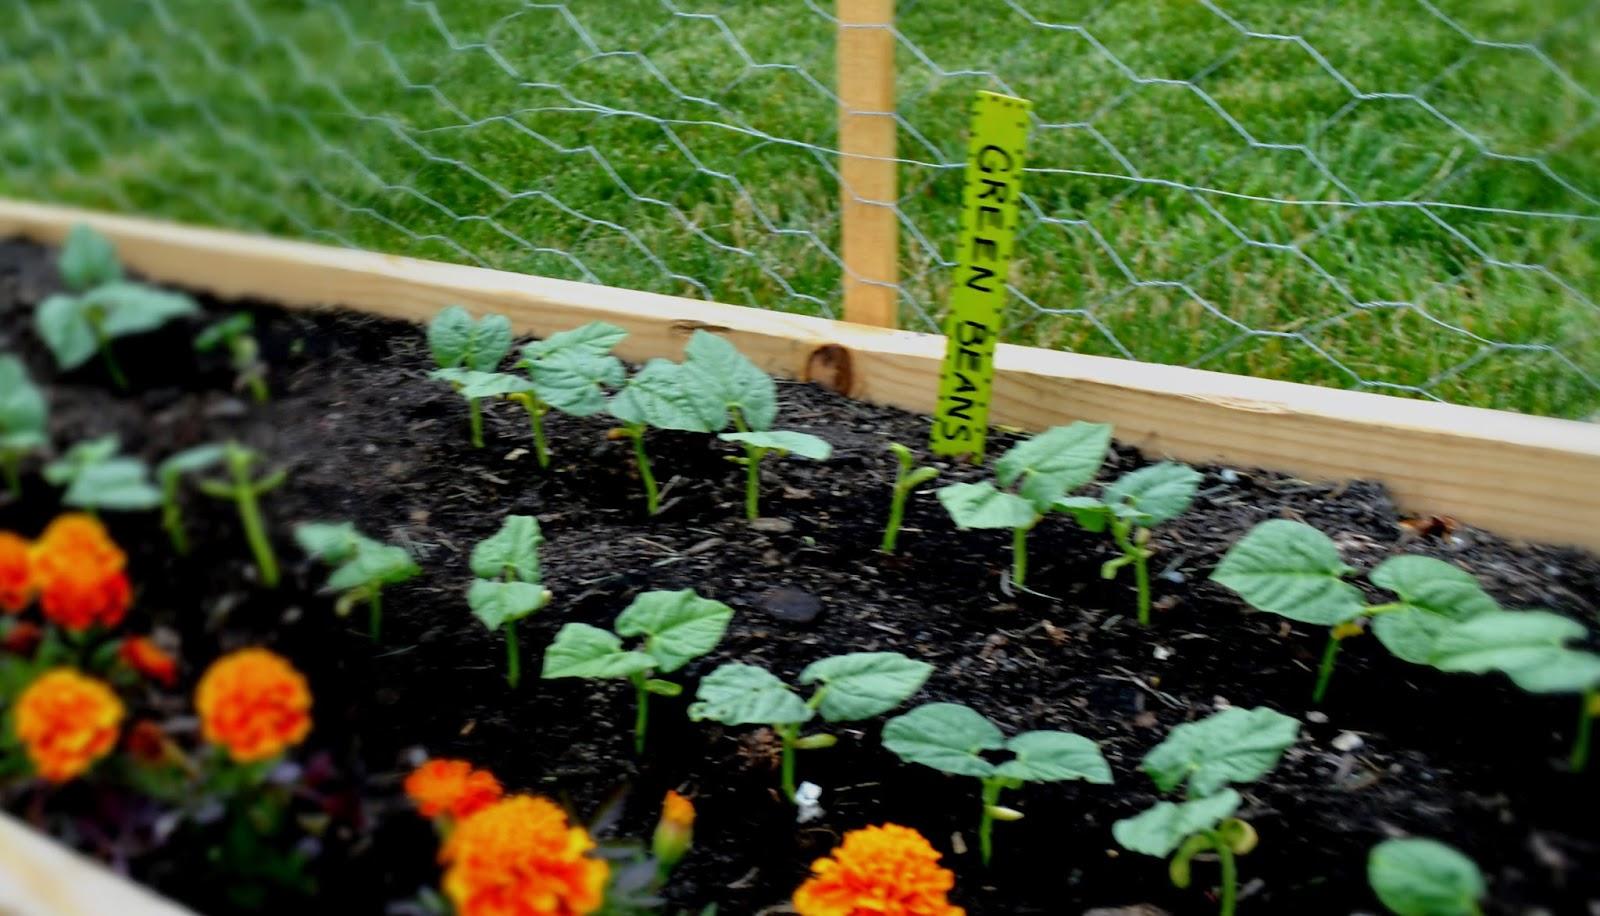 Loving Life Diy Garden Labels From Wooden Paint Sticks